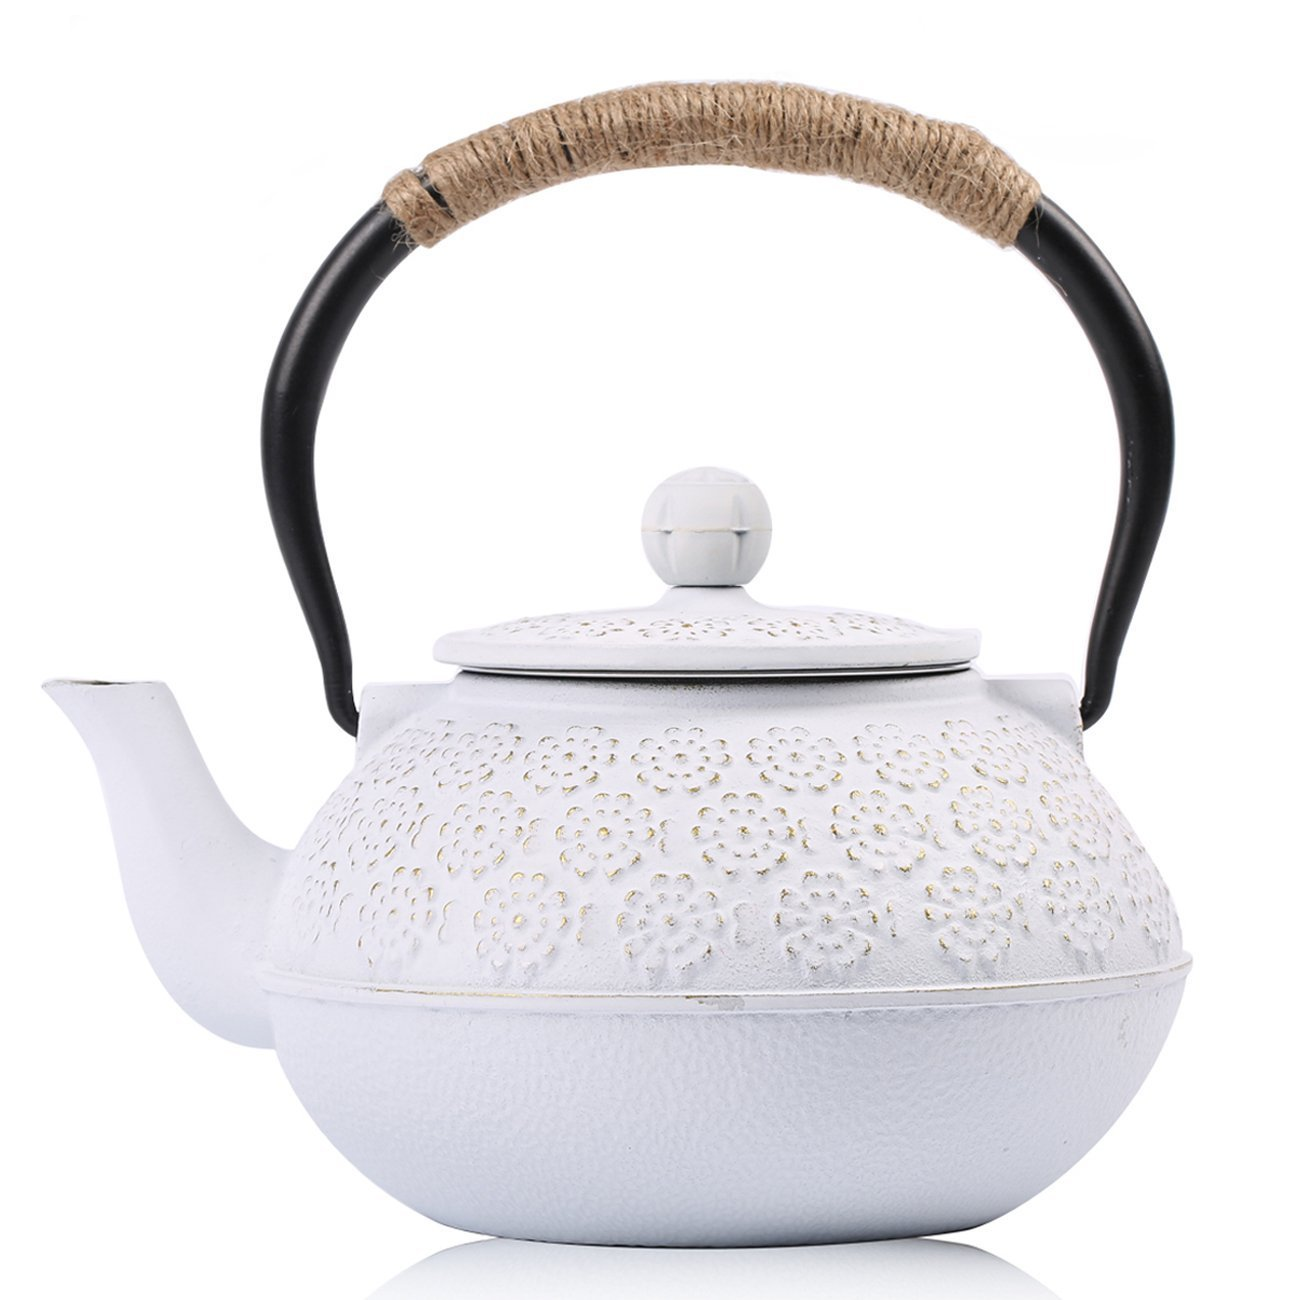 Cast Iron Teapot,Japanese Tea Kettle Sotya Tetsubin teapot with Infuser (1200ml/40oz) …